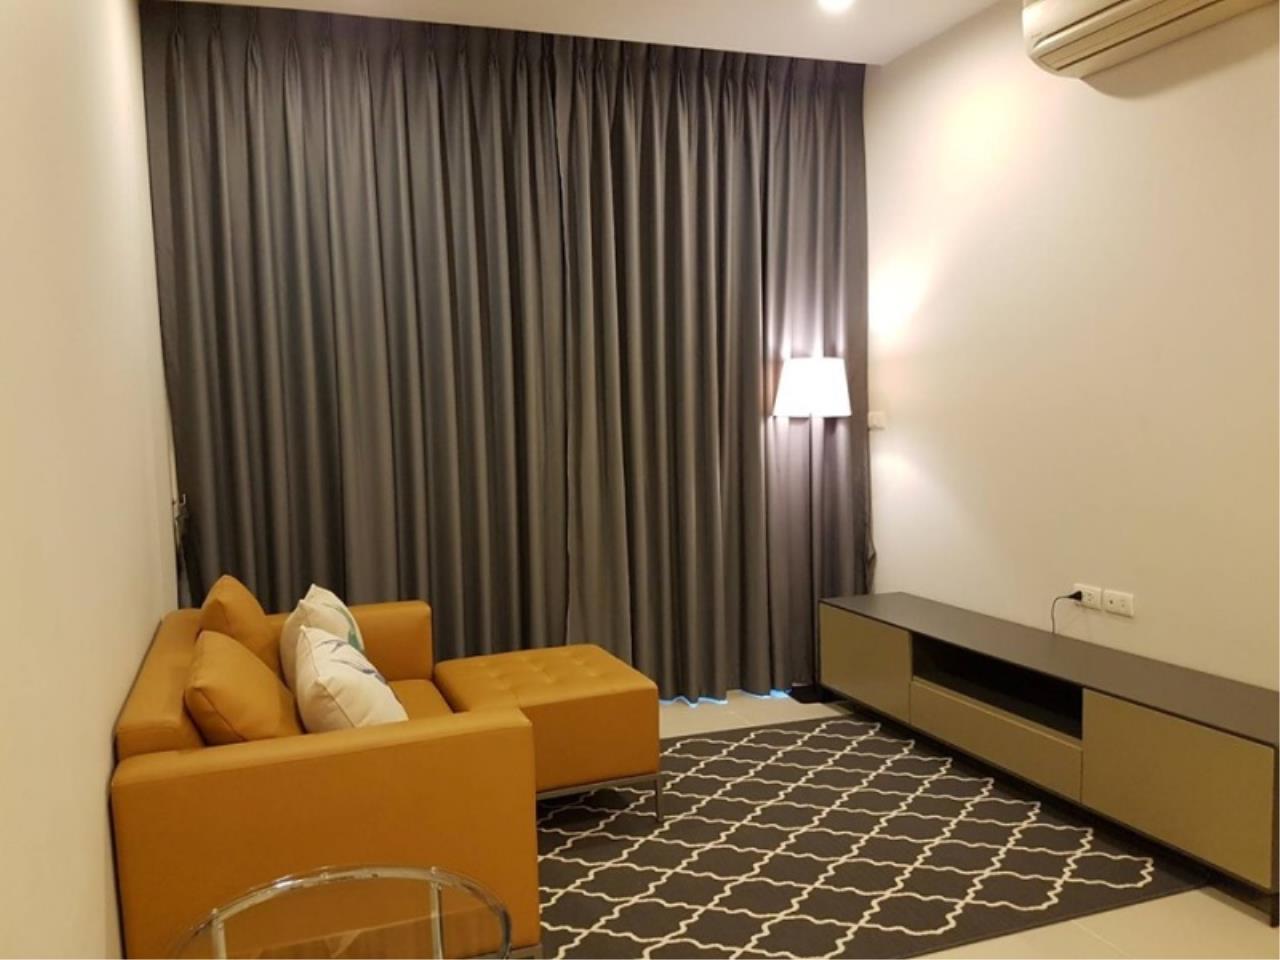 Century21 Skylux Agency's Circle Condominium / Condo For Rent / 1 Bedroom / 45 SQM / BTS Nana / Bangkok 1